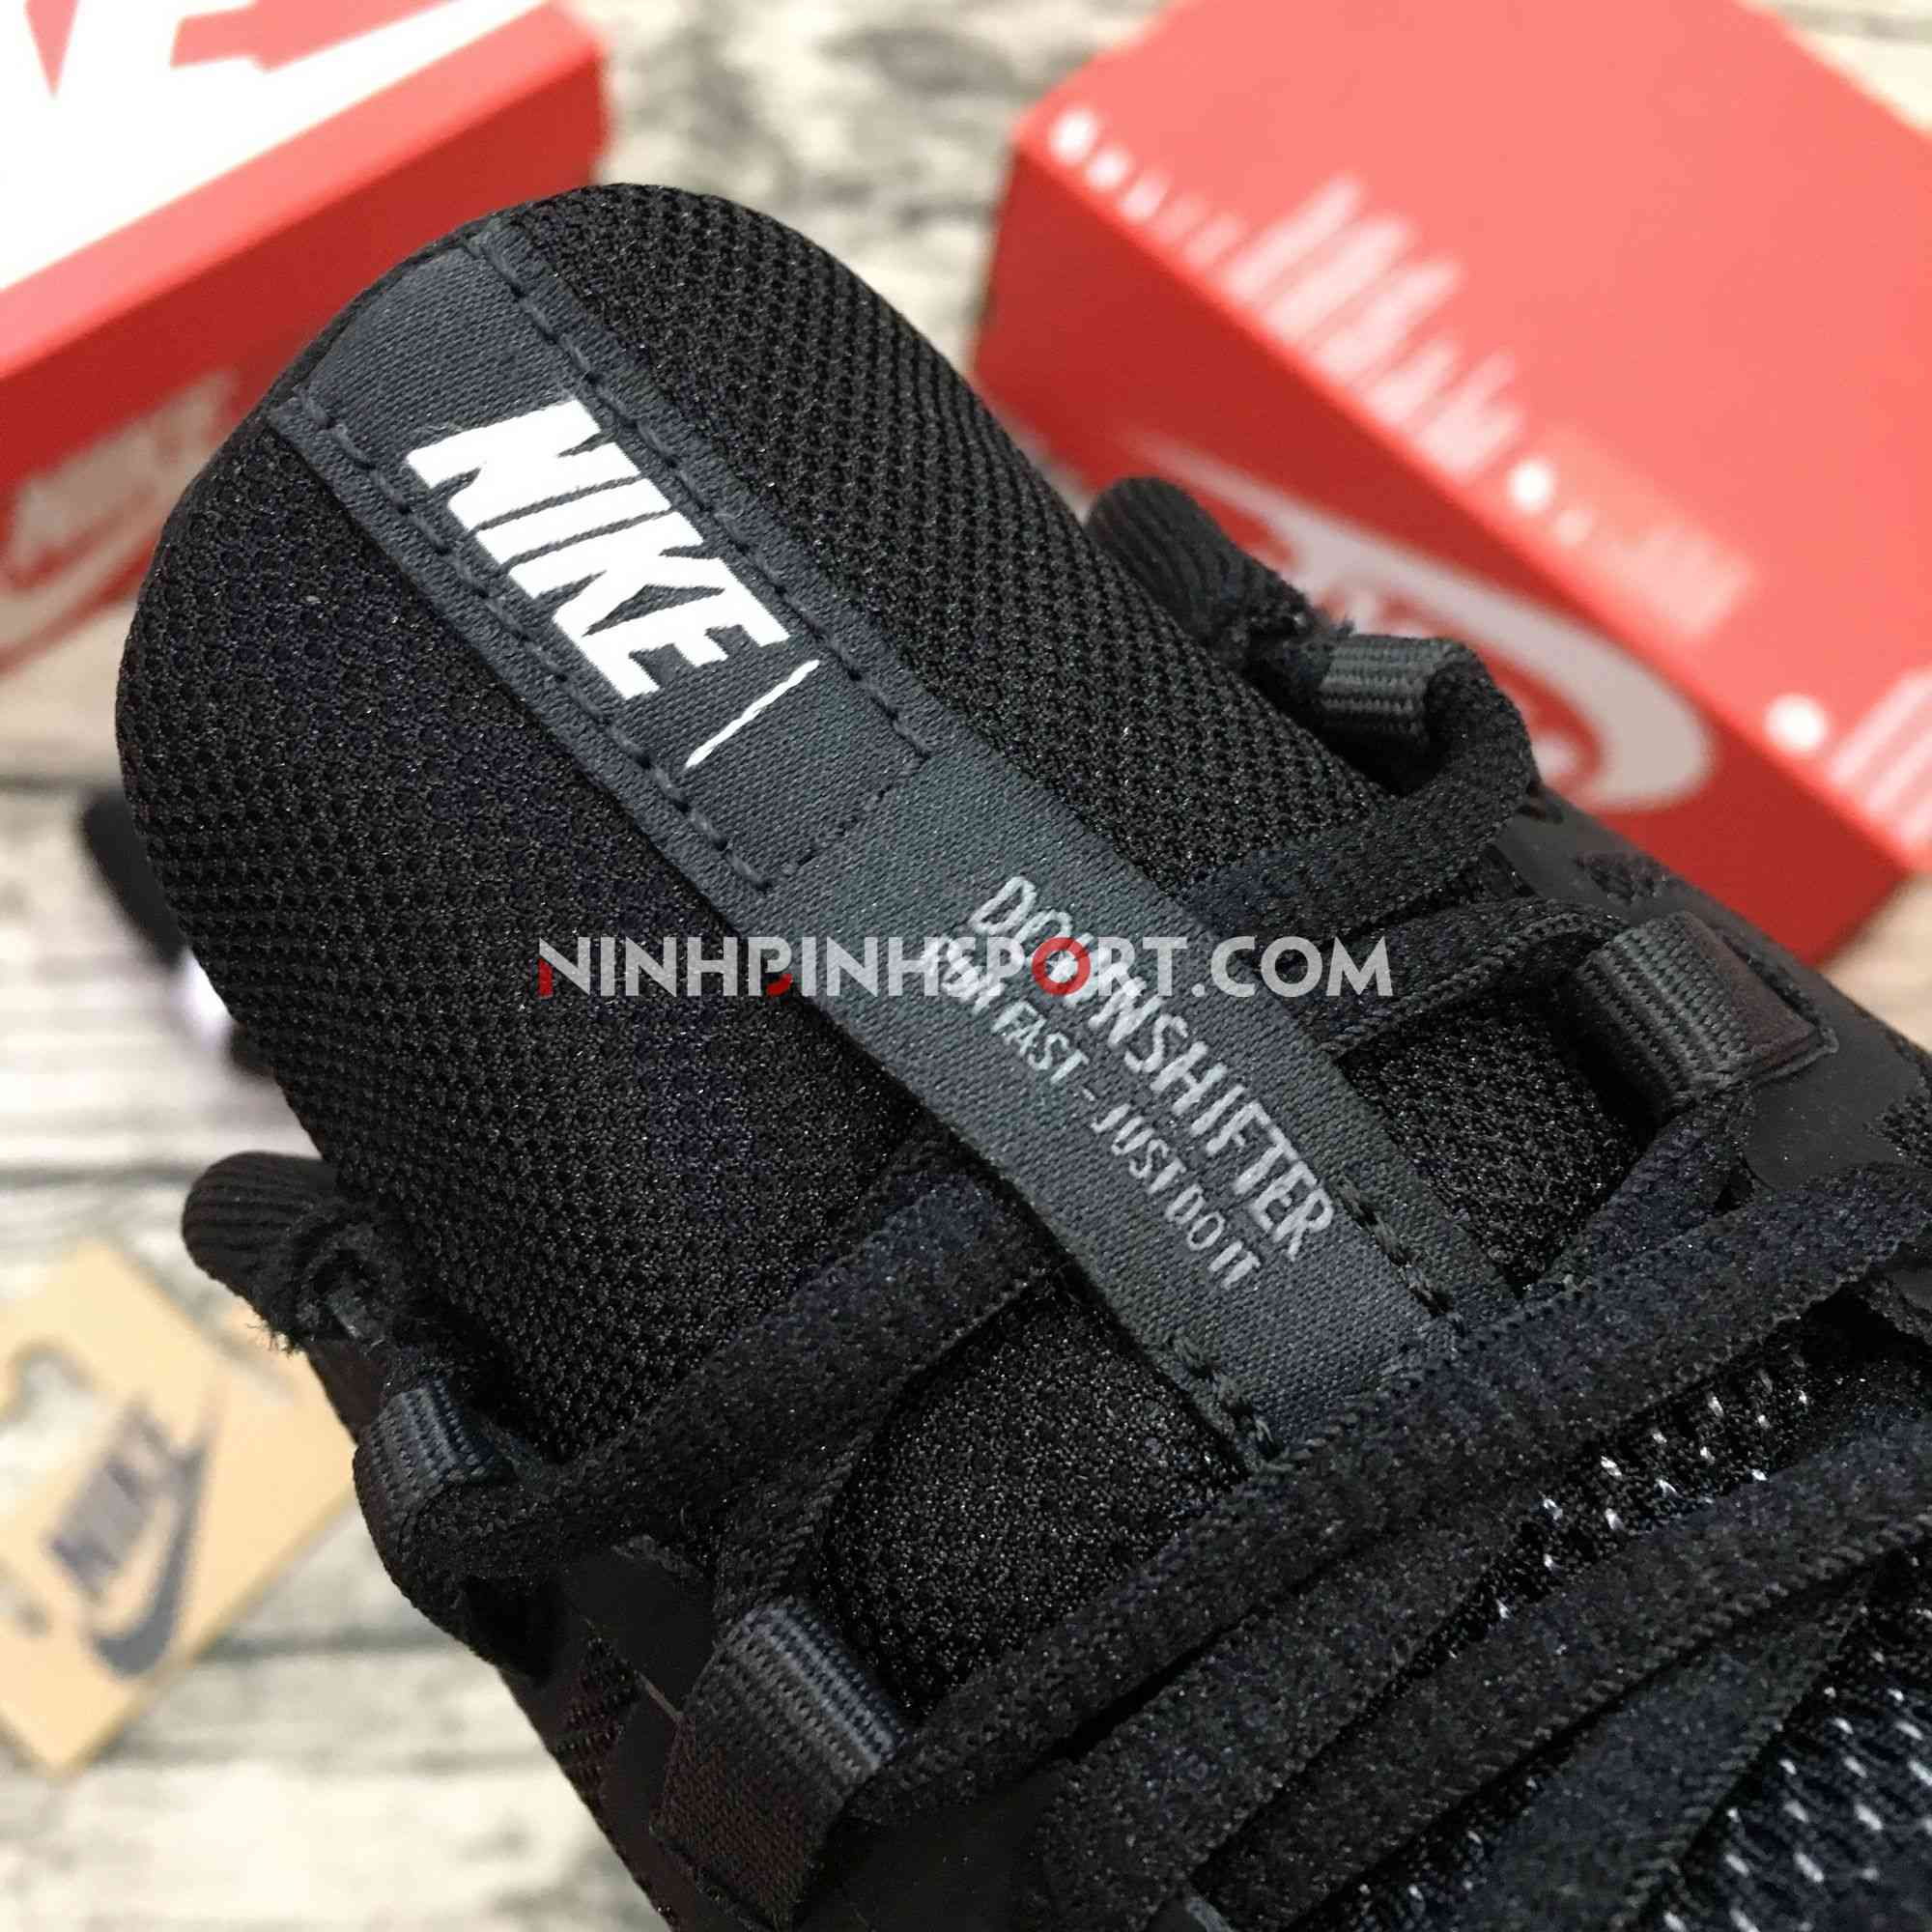 Giầy thể thao nam Nike DownShifter 9 AQ7481-002